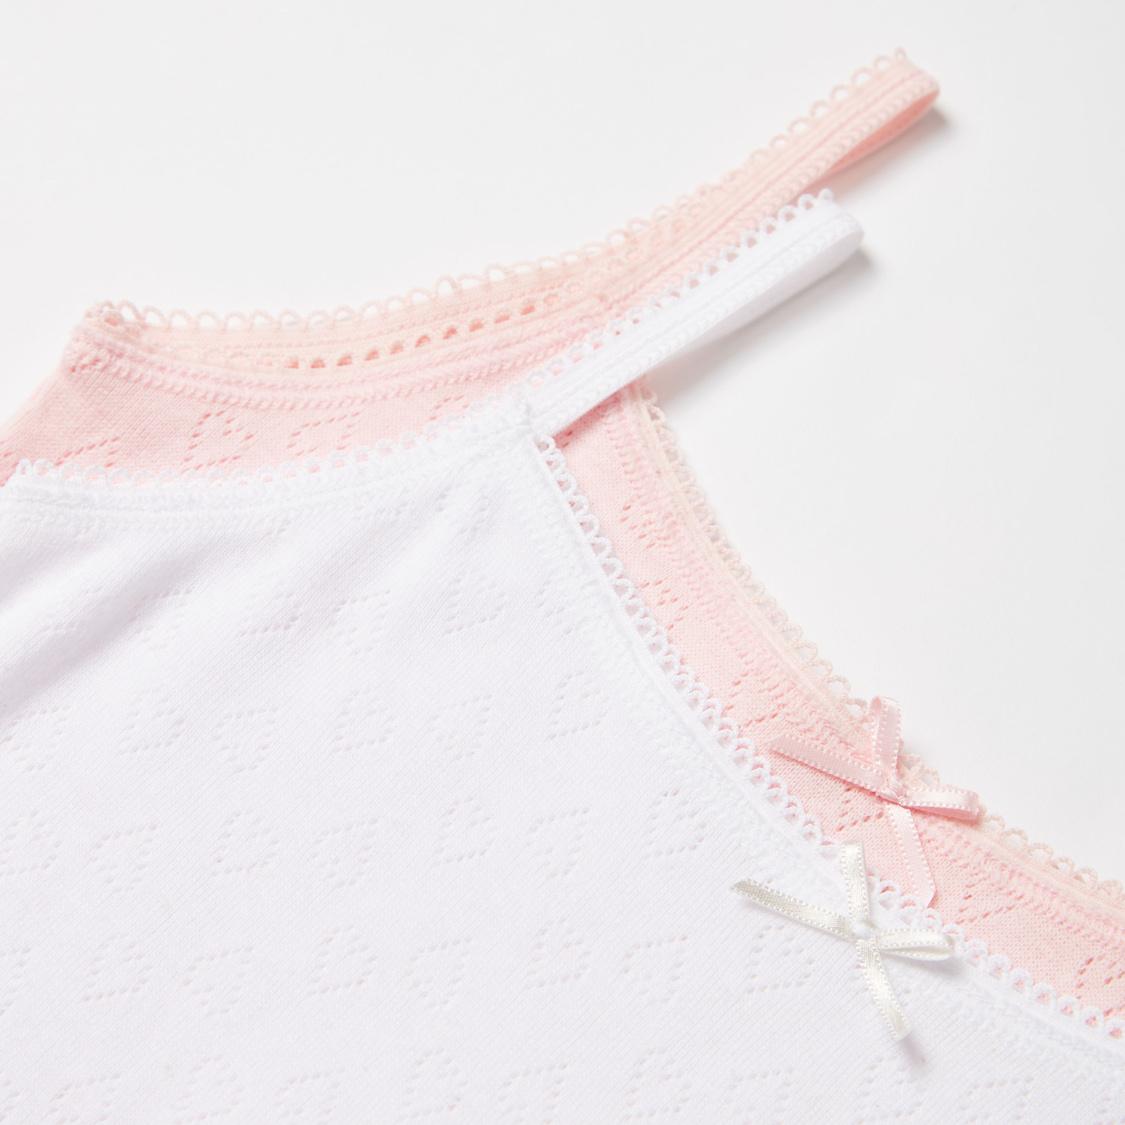 قميص داخلي قصير جاكار بدون أكمام وبتفاصيل دانتيل- طقم من قطعتين